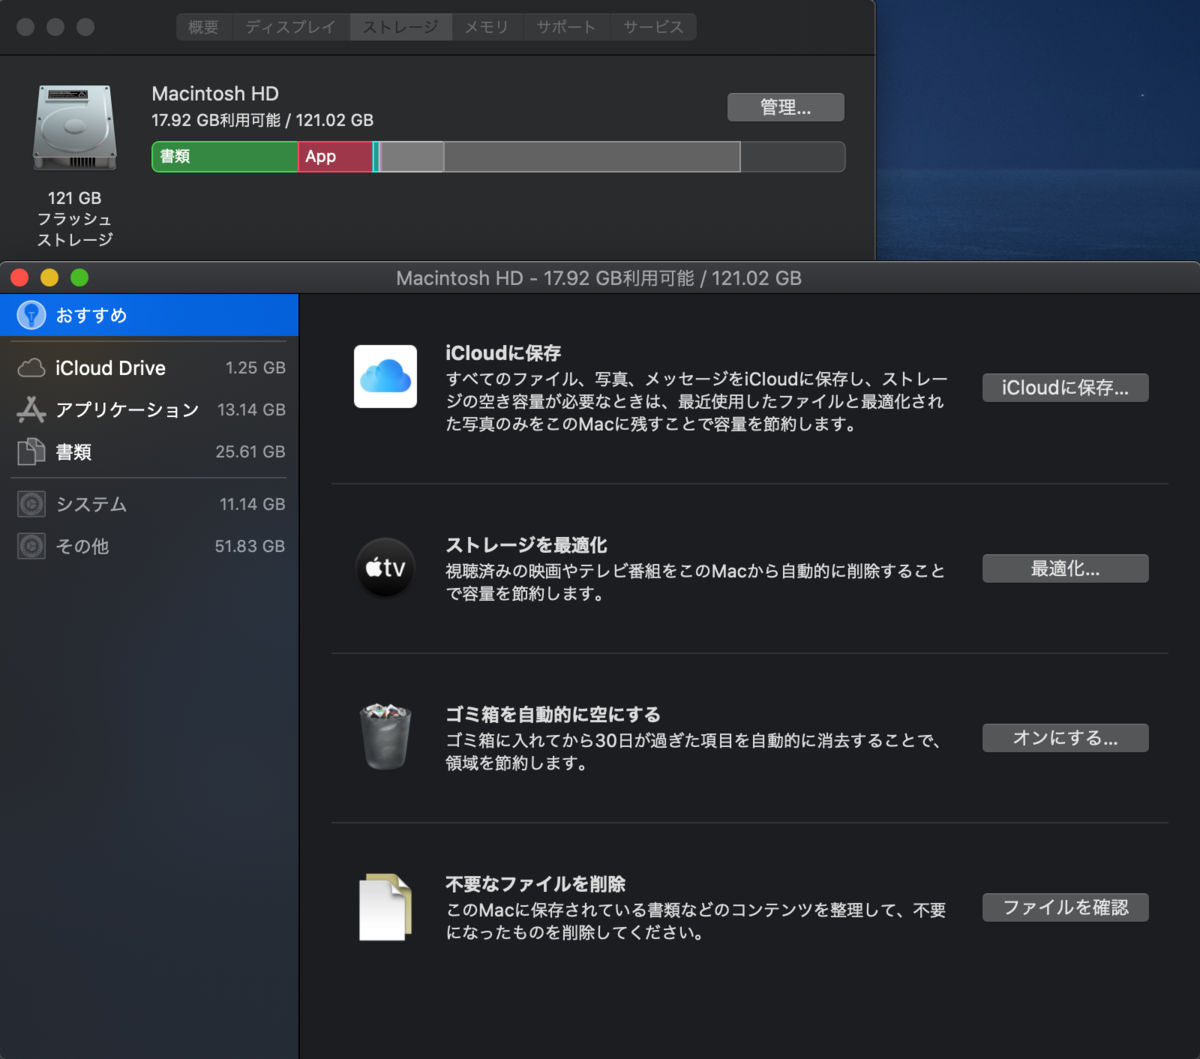 f:id:toshi0383:20200423214842p:plain